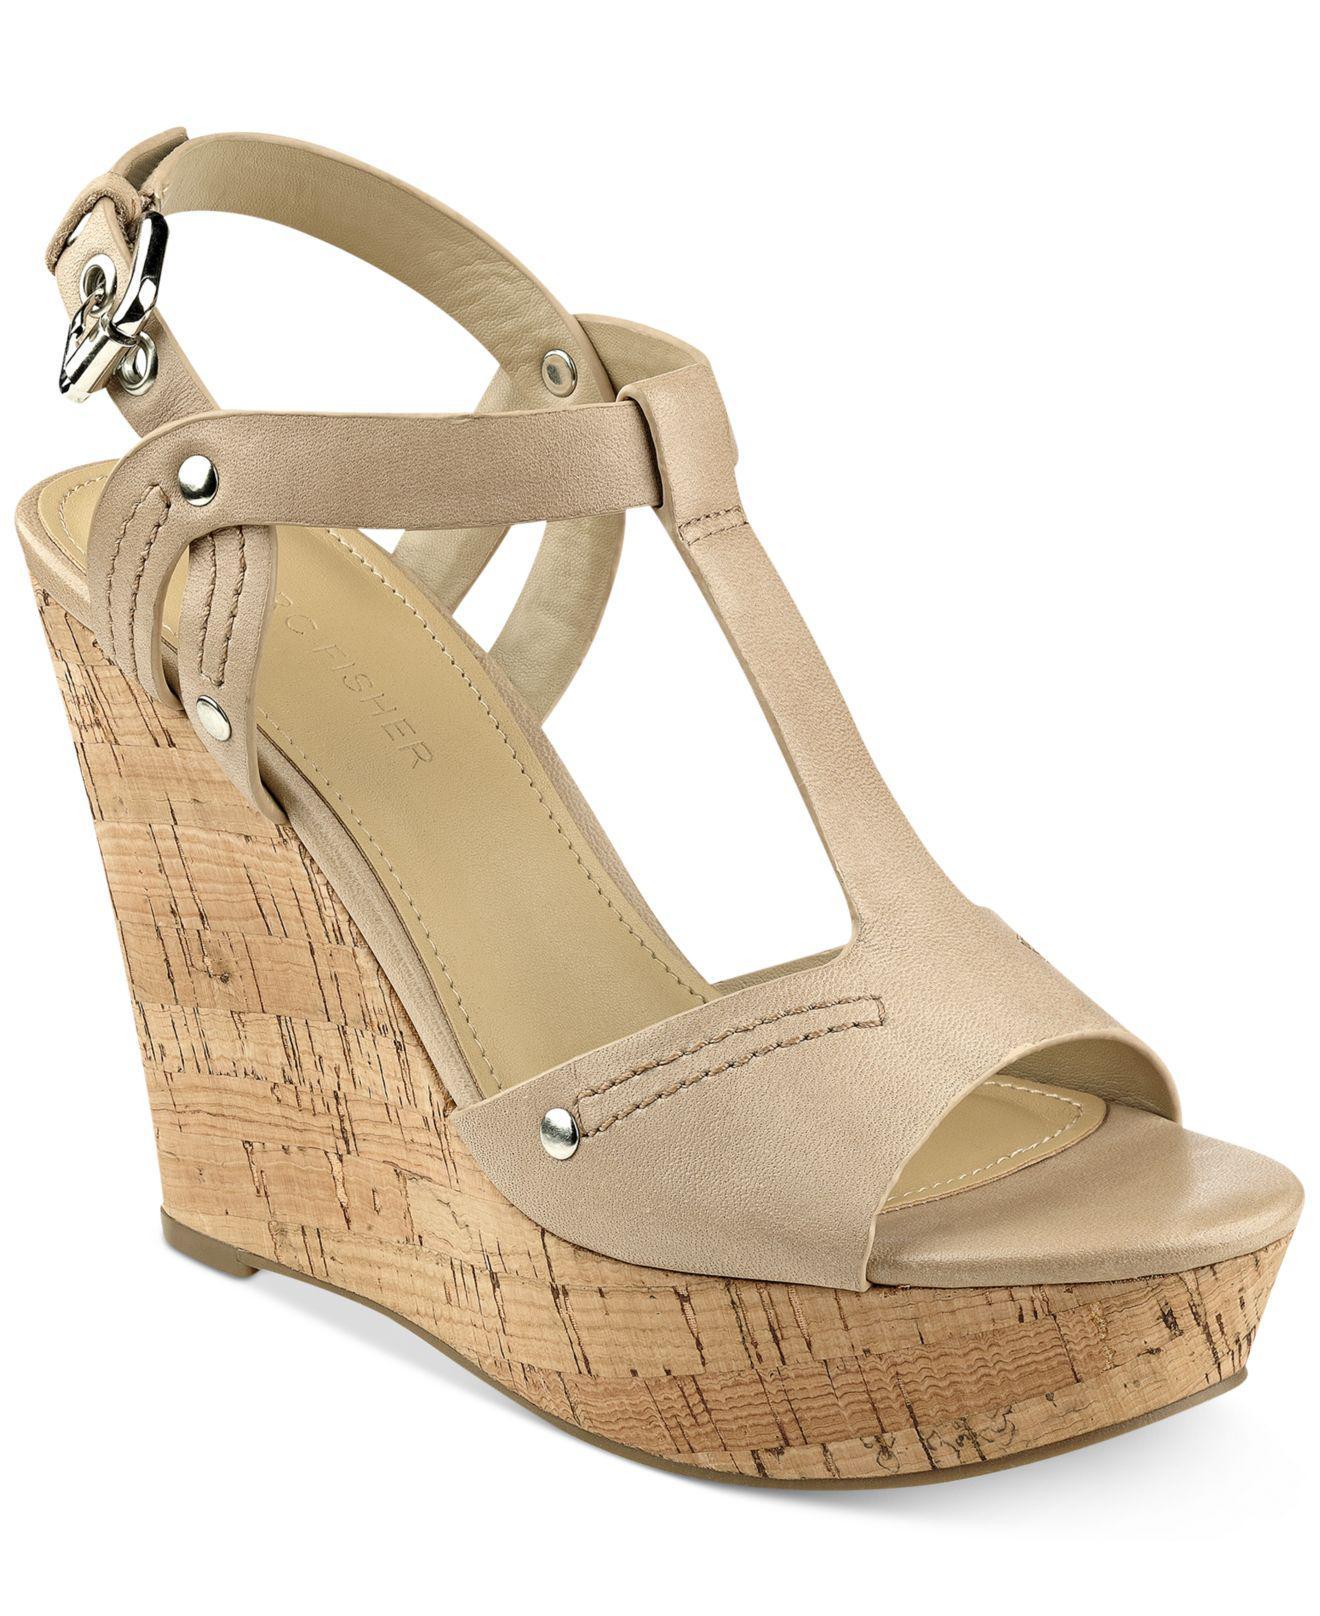 cbbf13ef1f3 Marc Fisher Multicolor Helma Platform Wedge Sandals